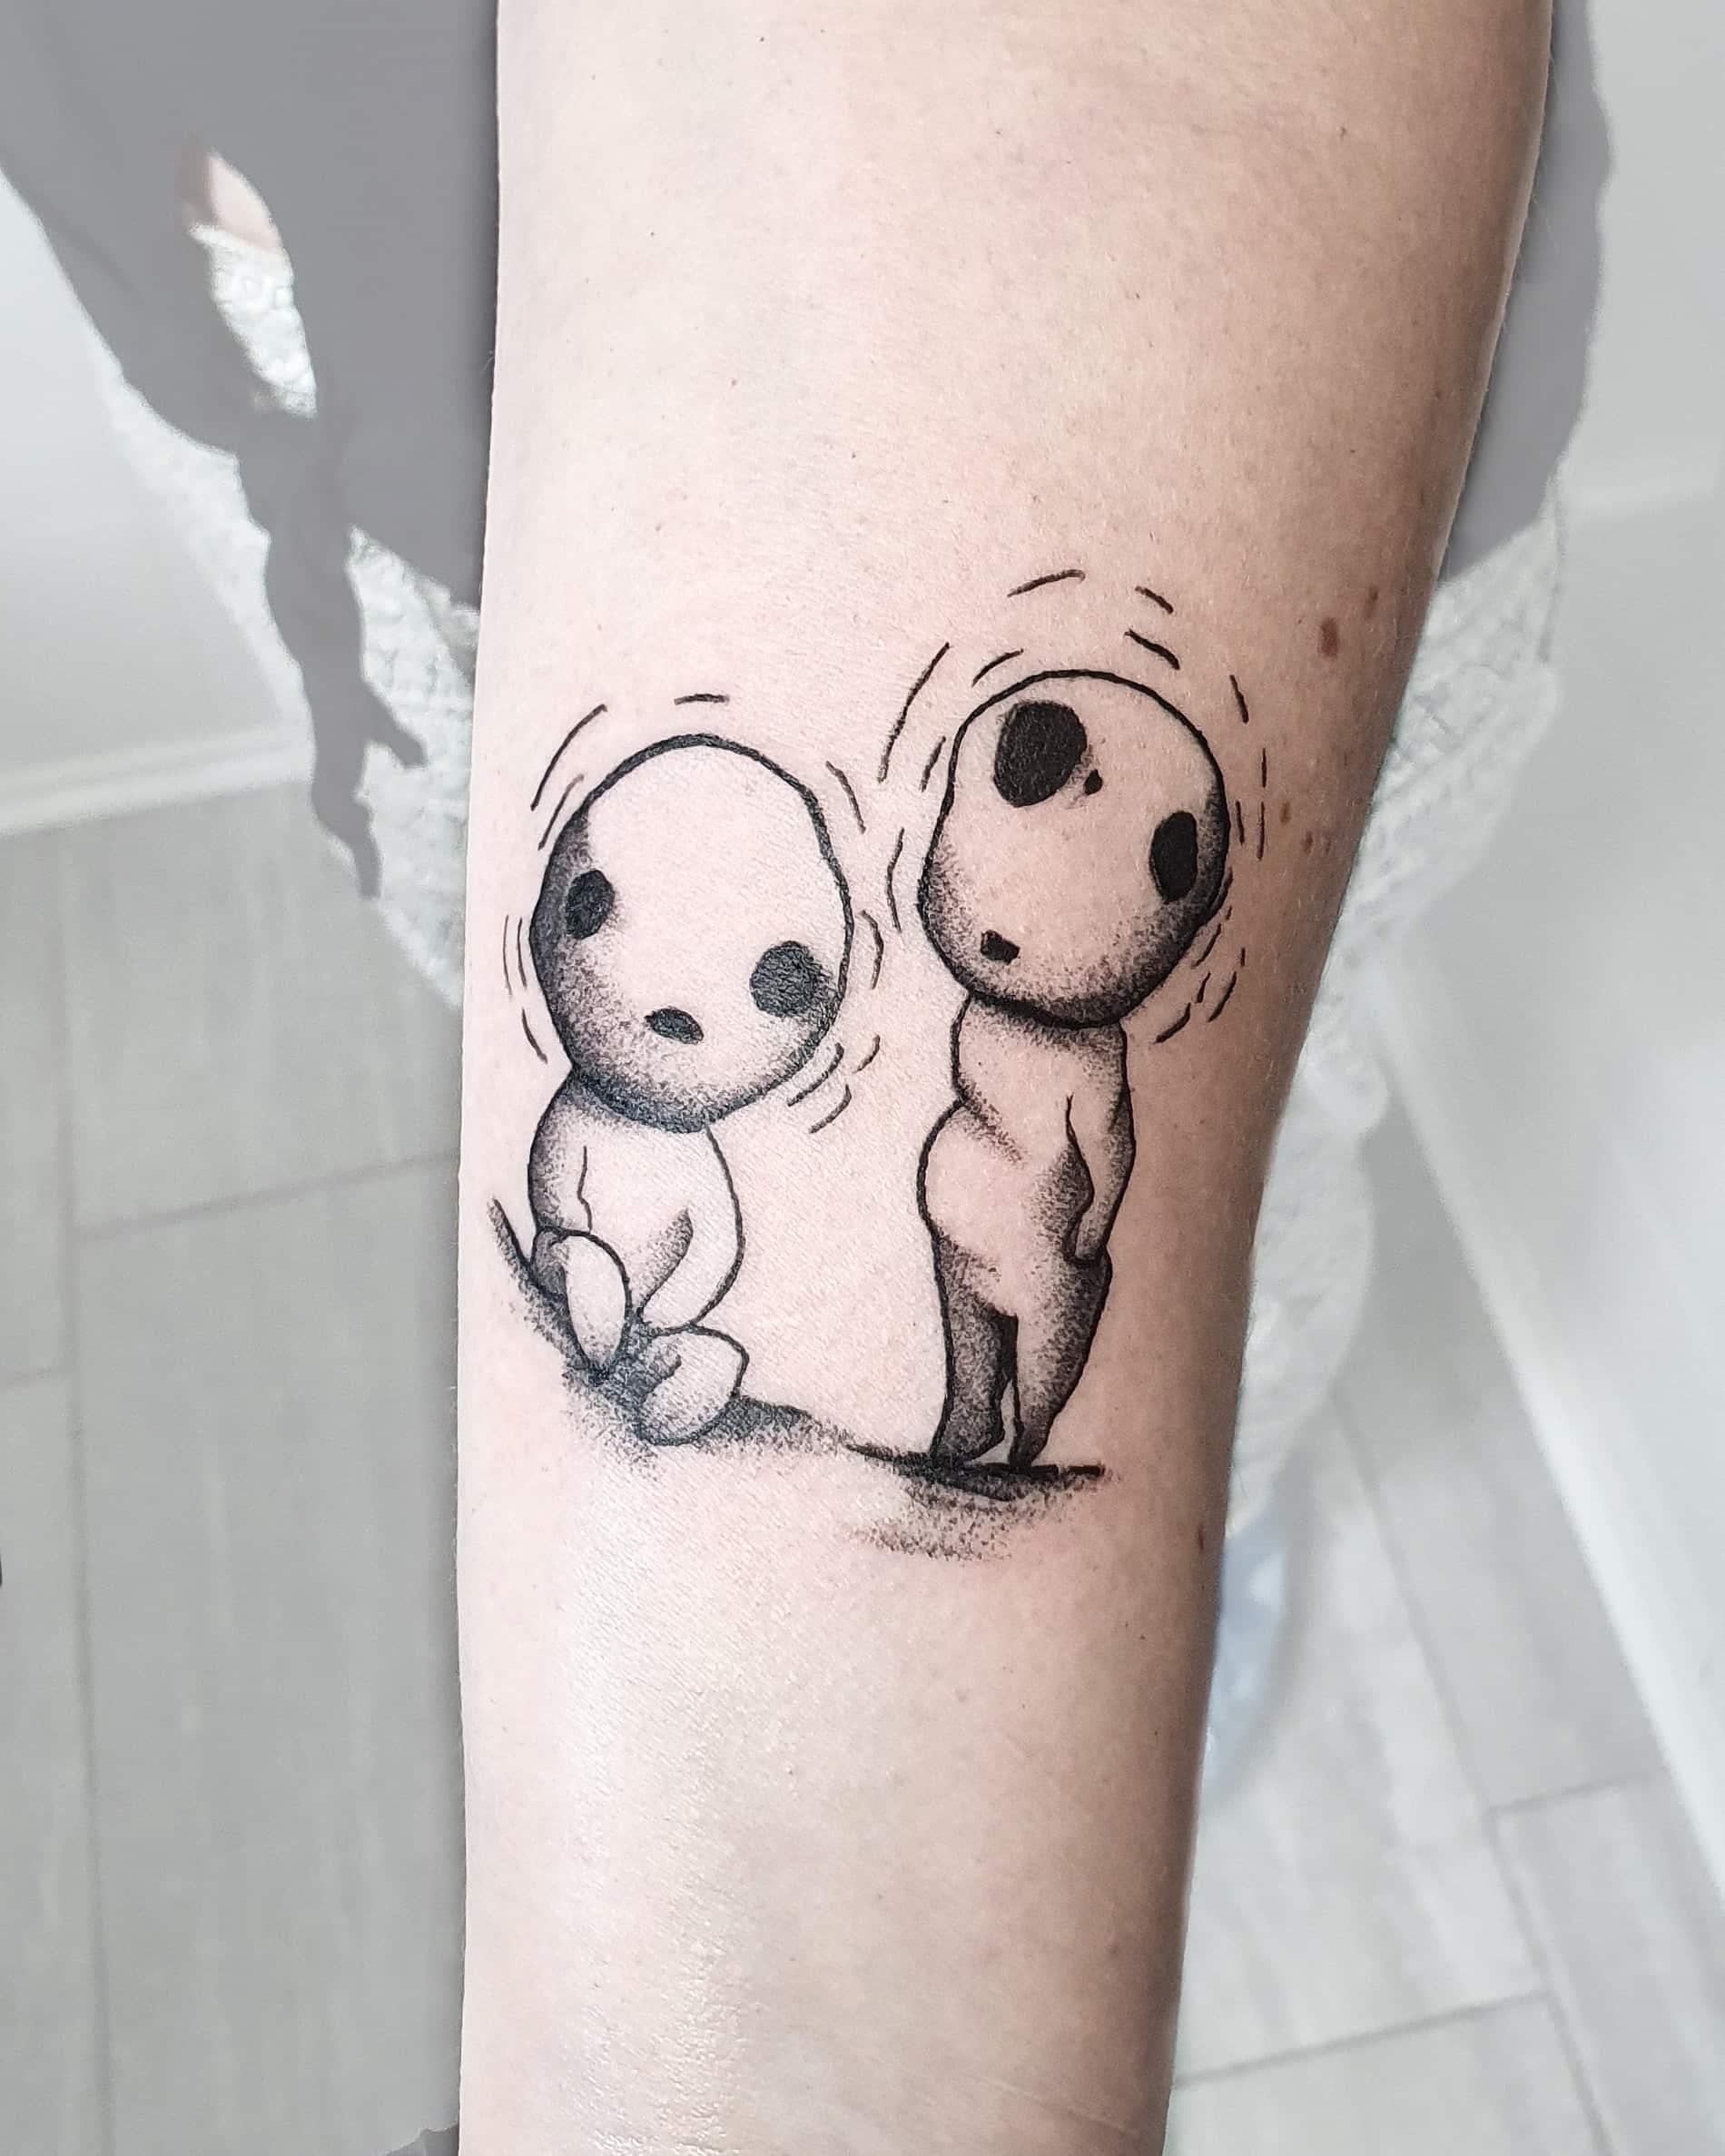 kodama-tattoo-rome-elizabeth-gein